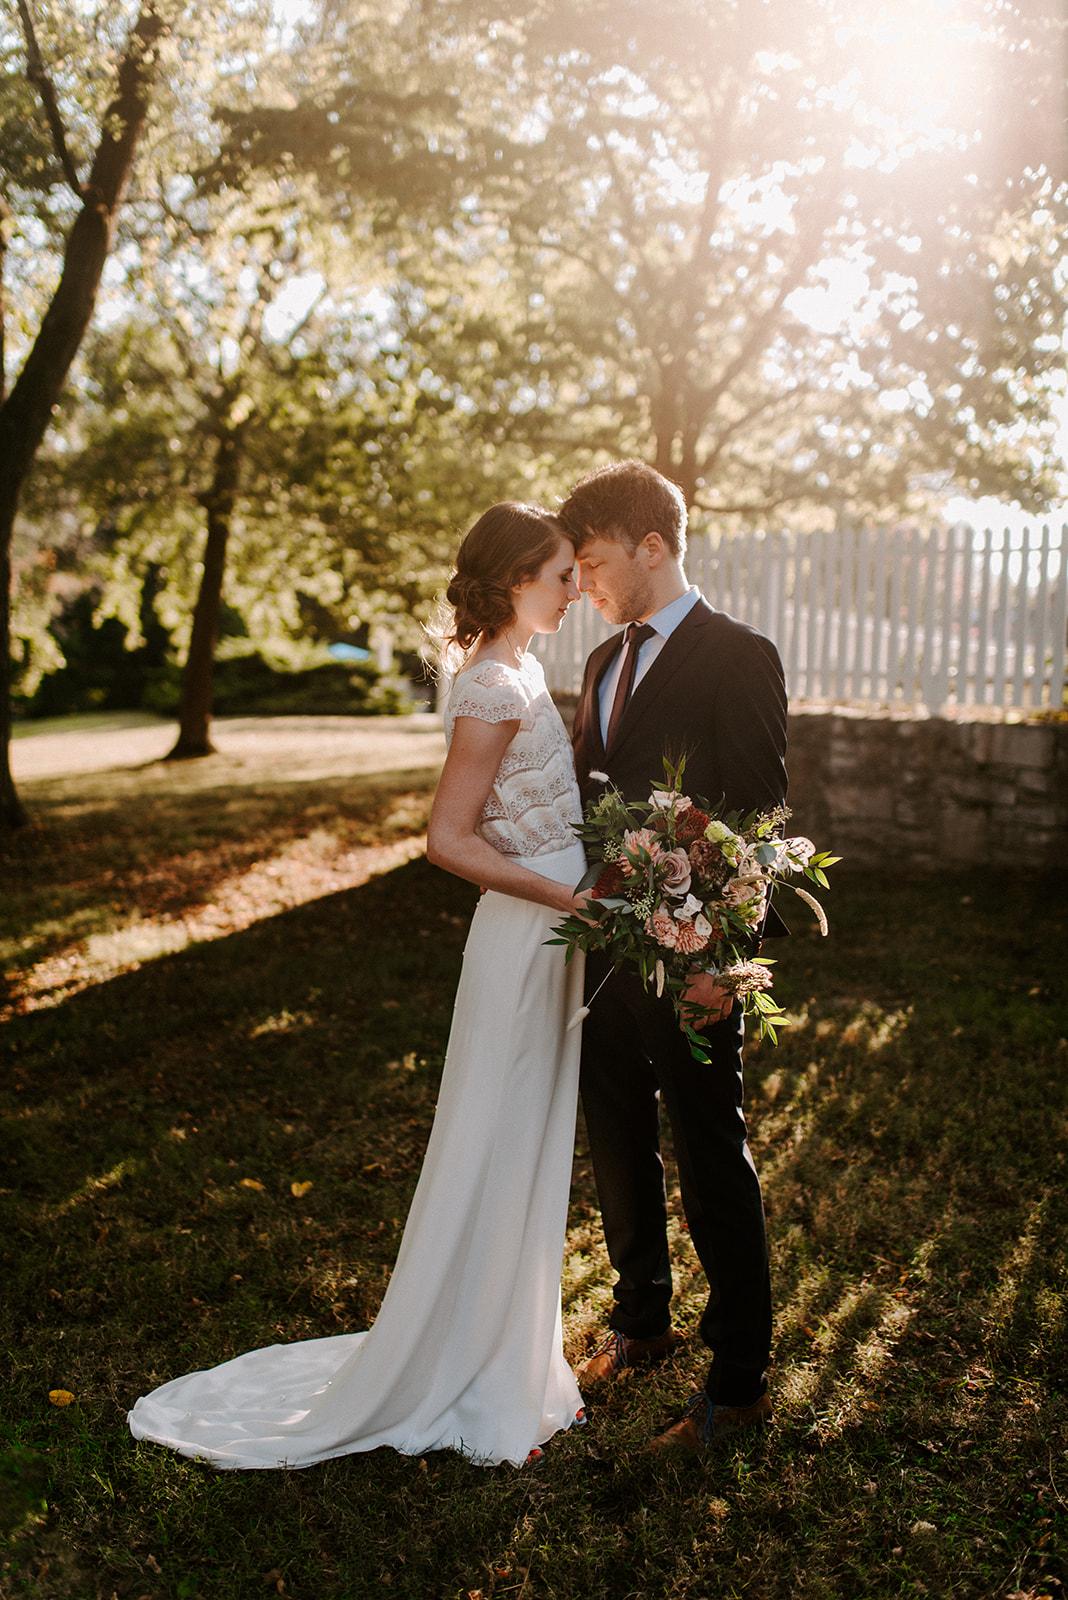 Sunset wedding photos by Savannah Ashley Photography